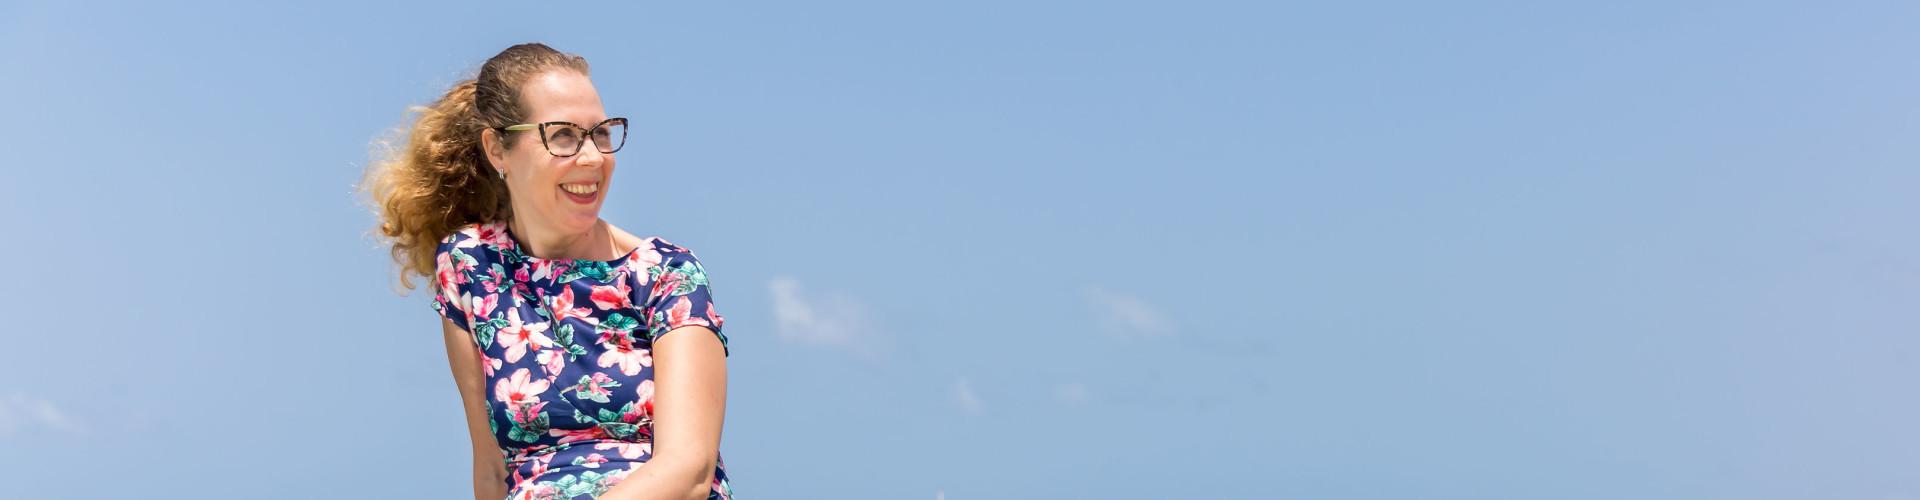 Bijles Aruba - Inge Beek